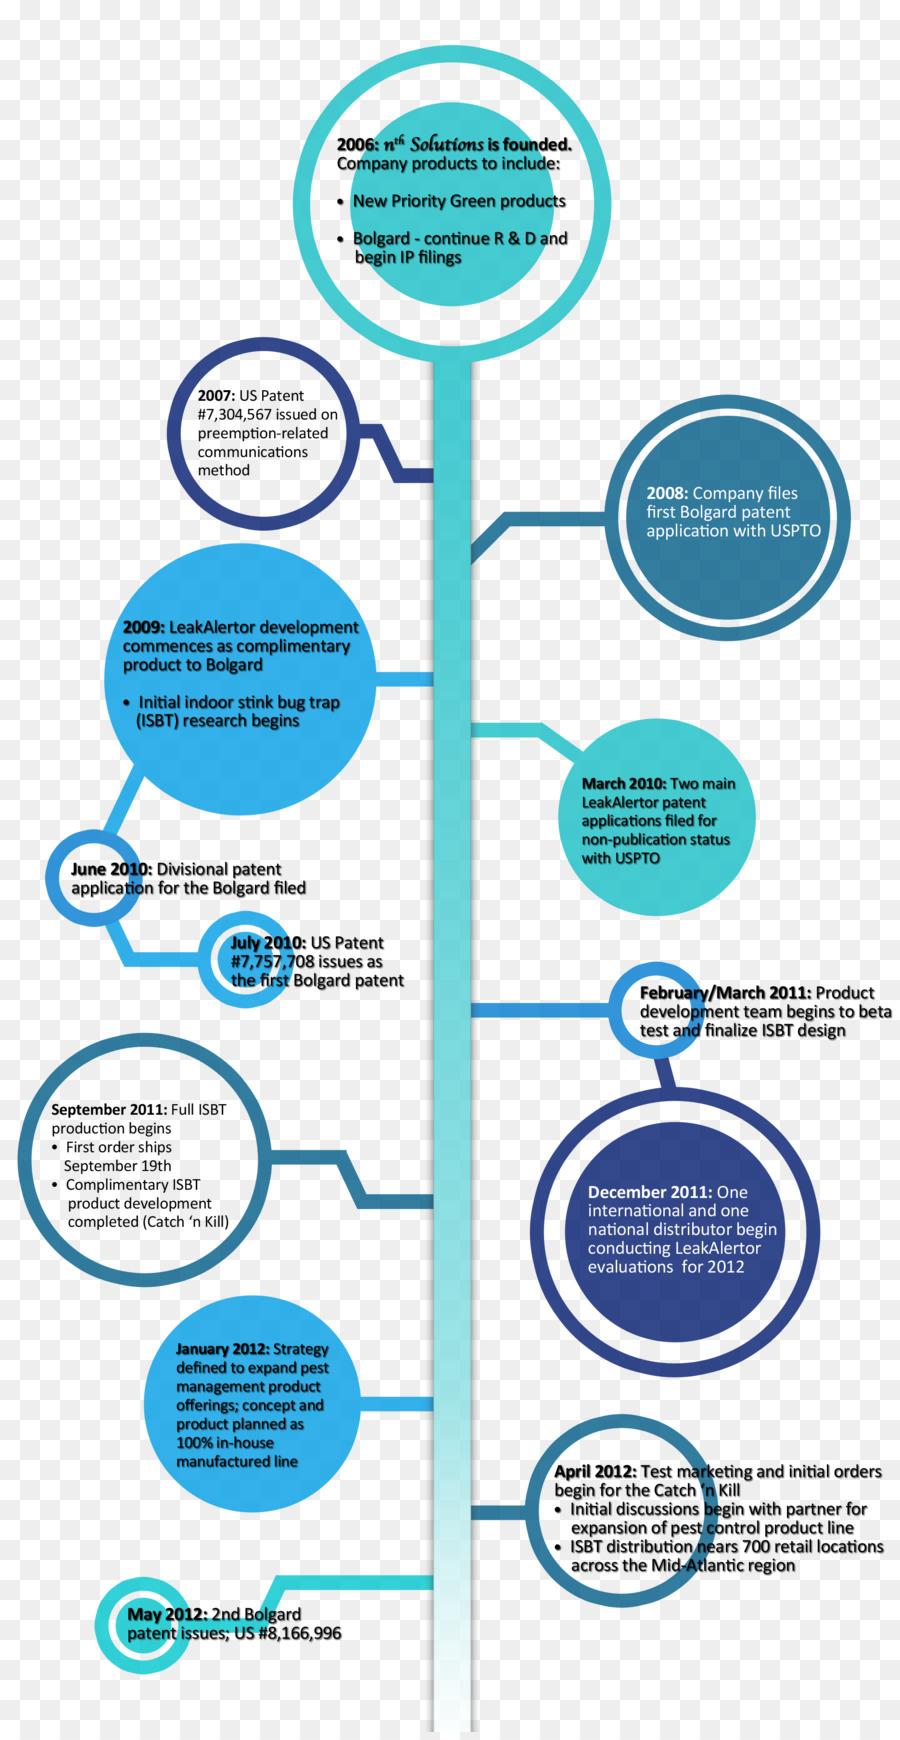 medium resolution of brand water diagram text aqua png